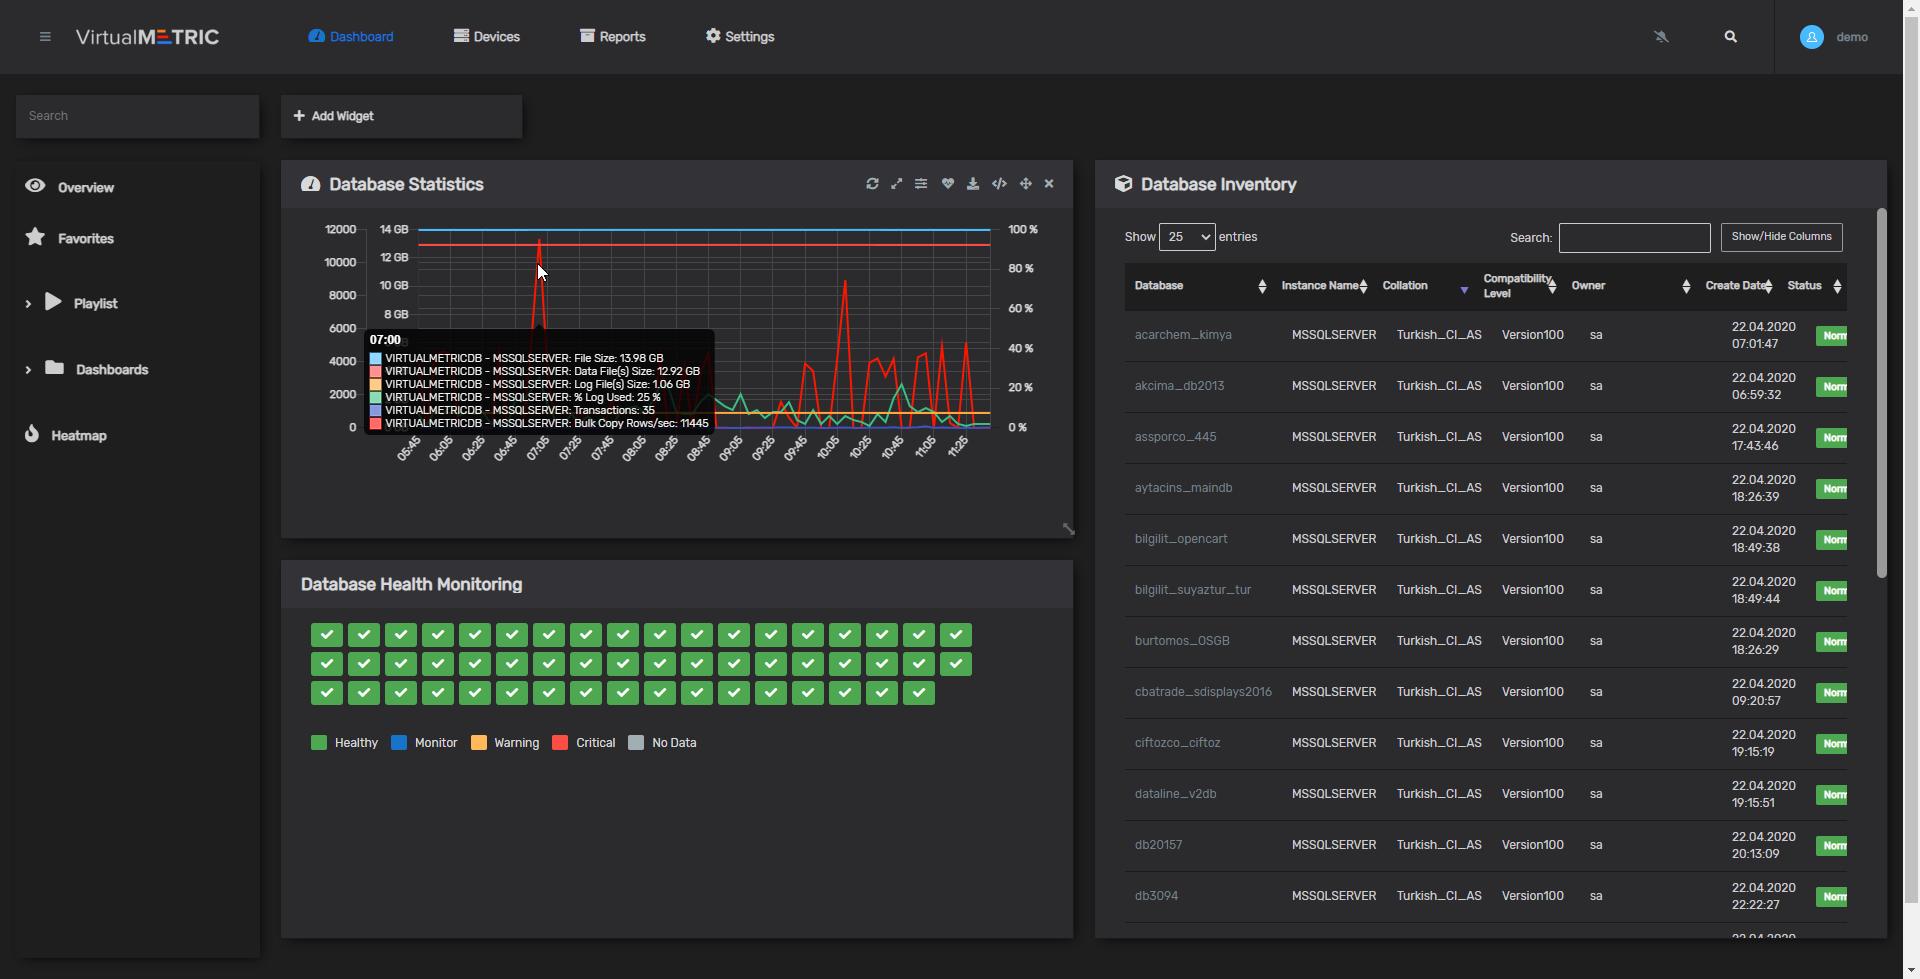 Database Health Monitoring